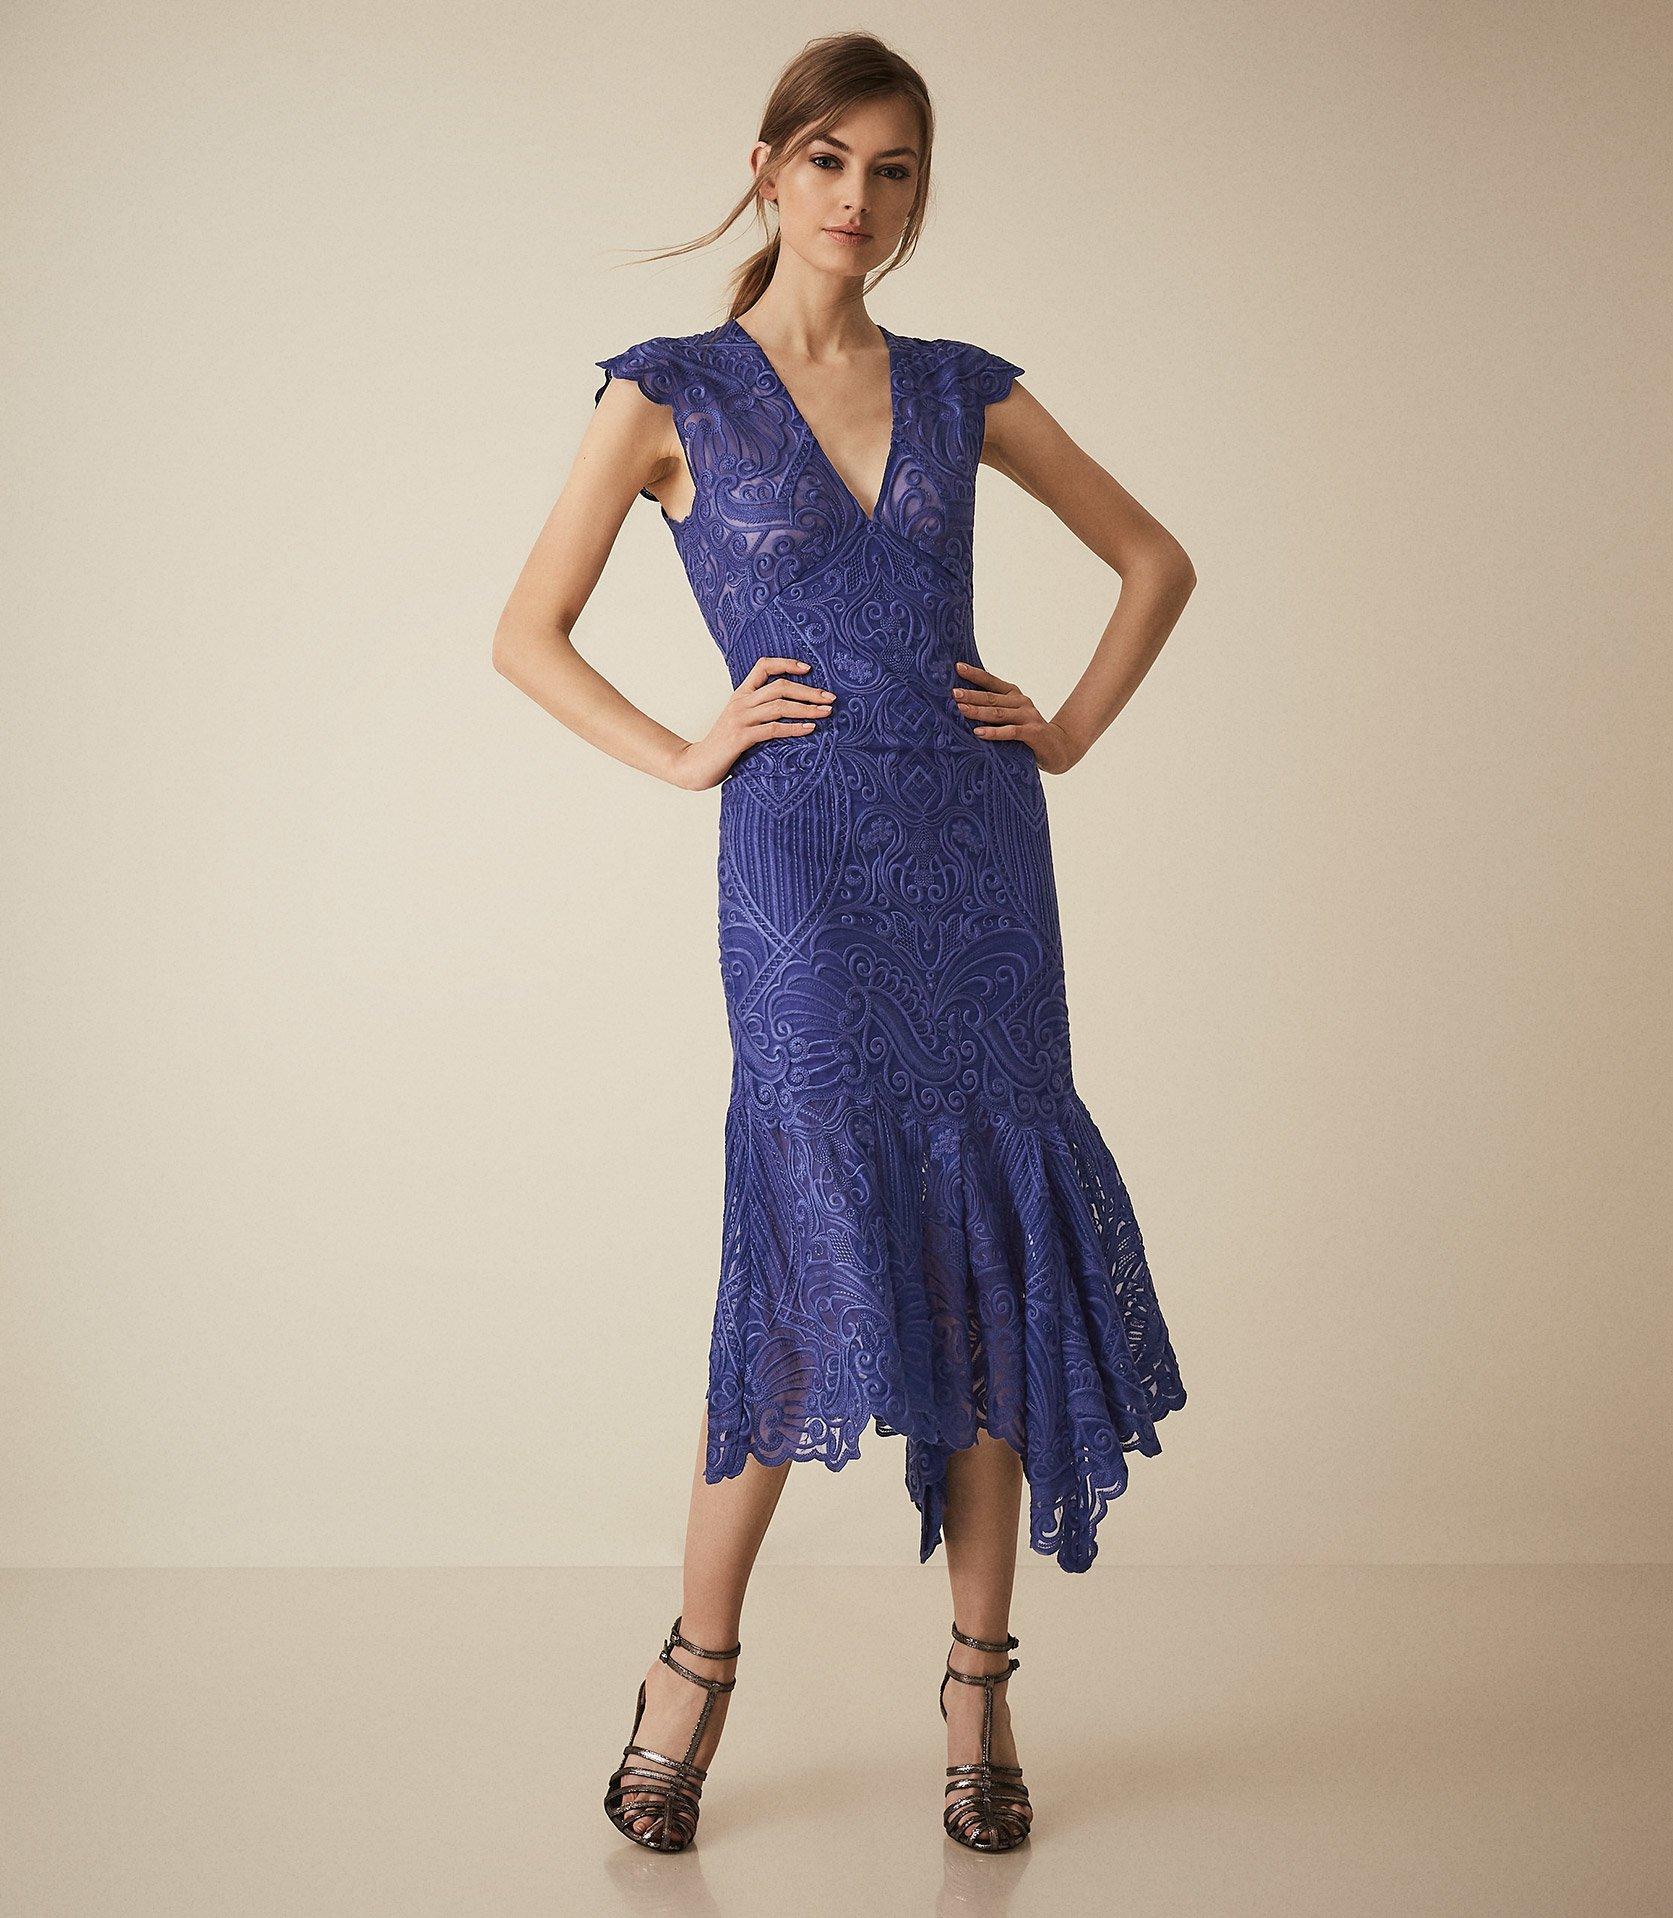 8092fb9954 Lyst - Reiss Anastasia - Lace Overlay Flute Hem Midi Dress in Blue